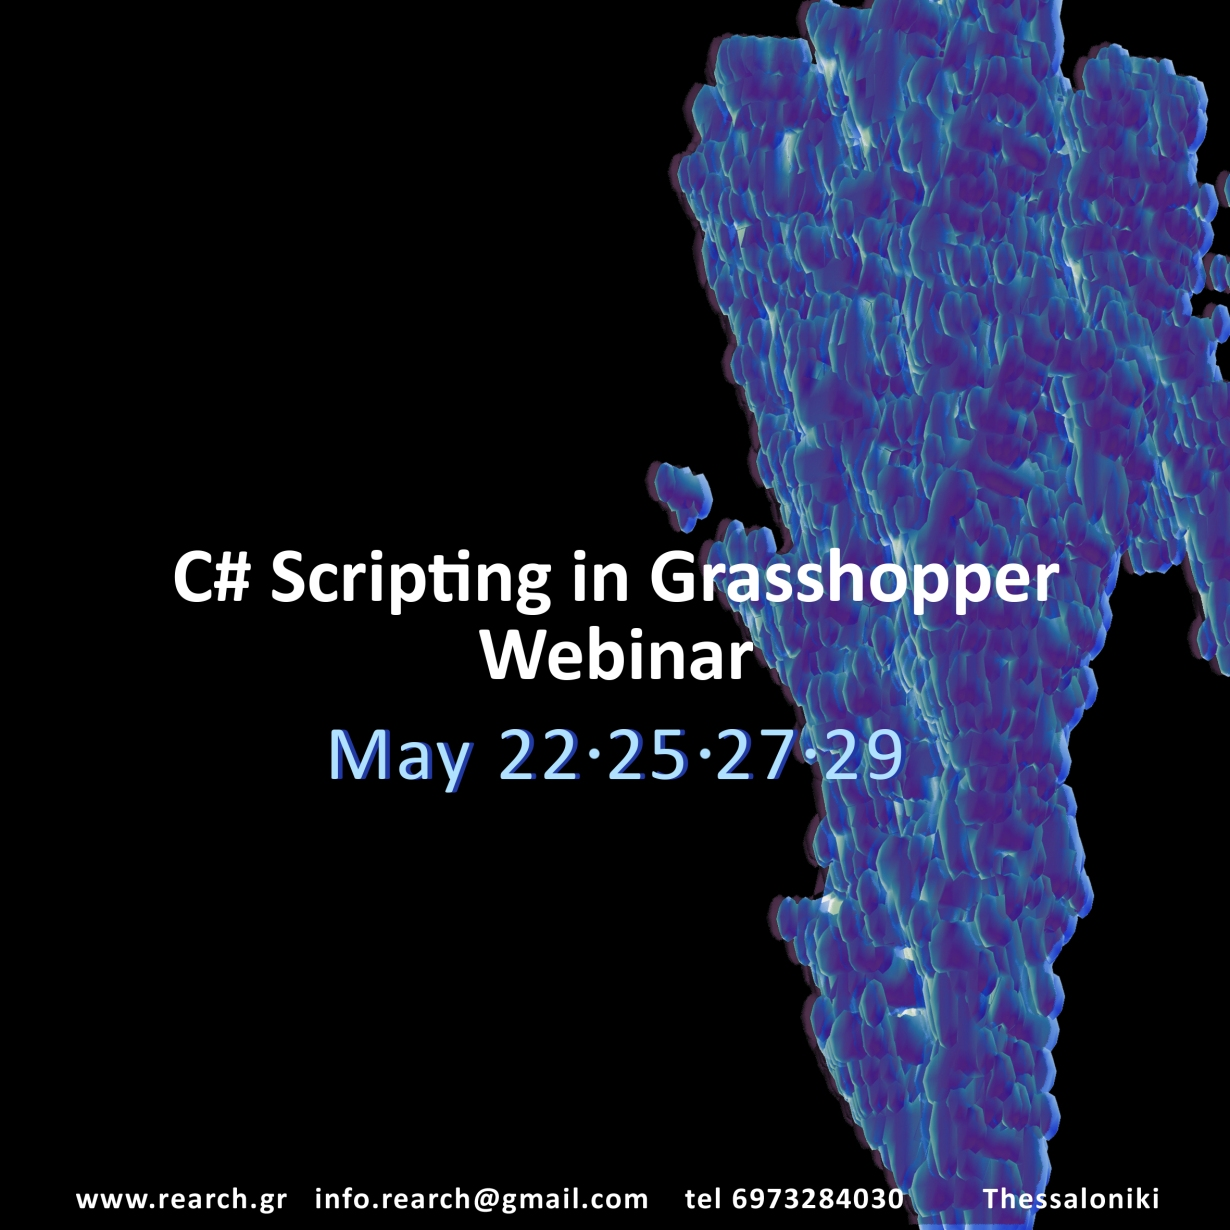 C# Scripting in Grasshopper Webinar